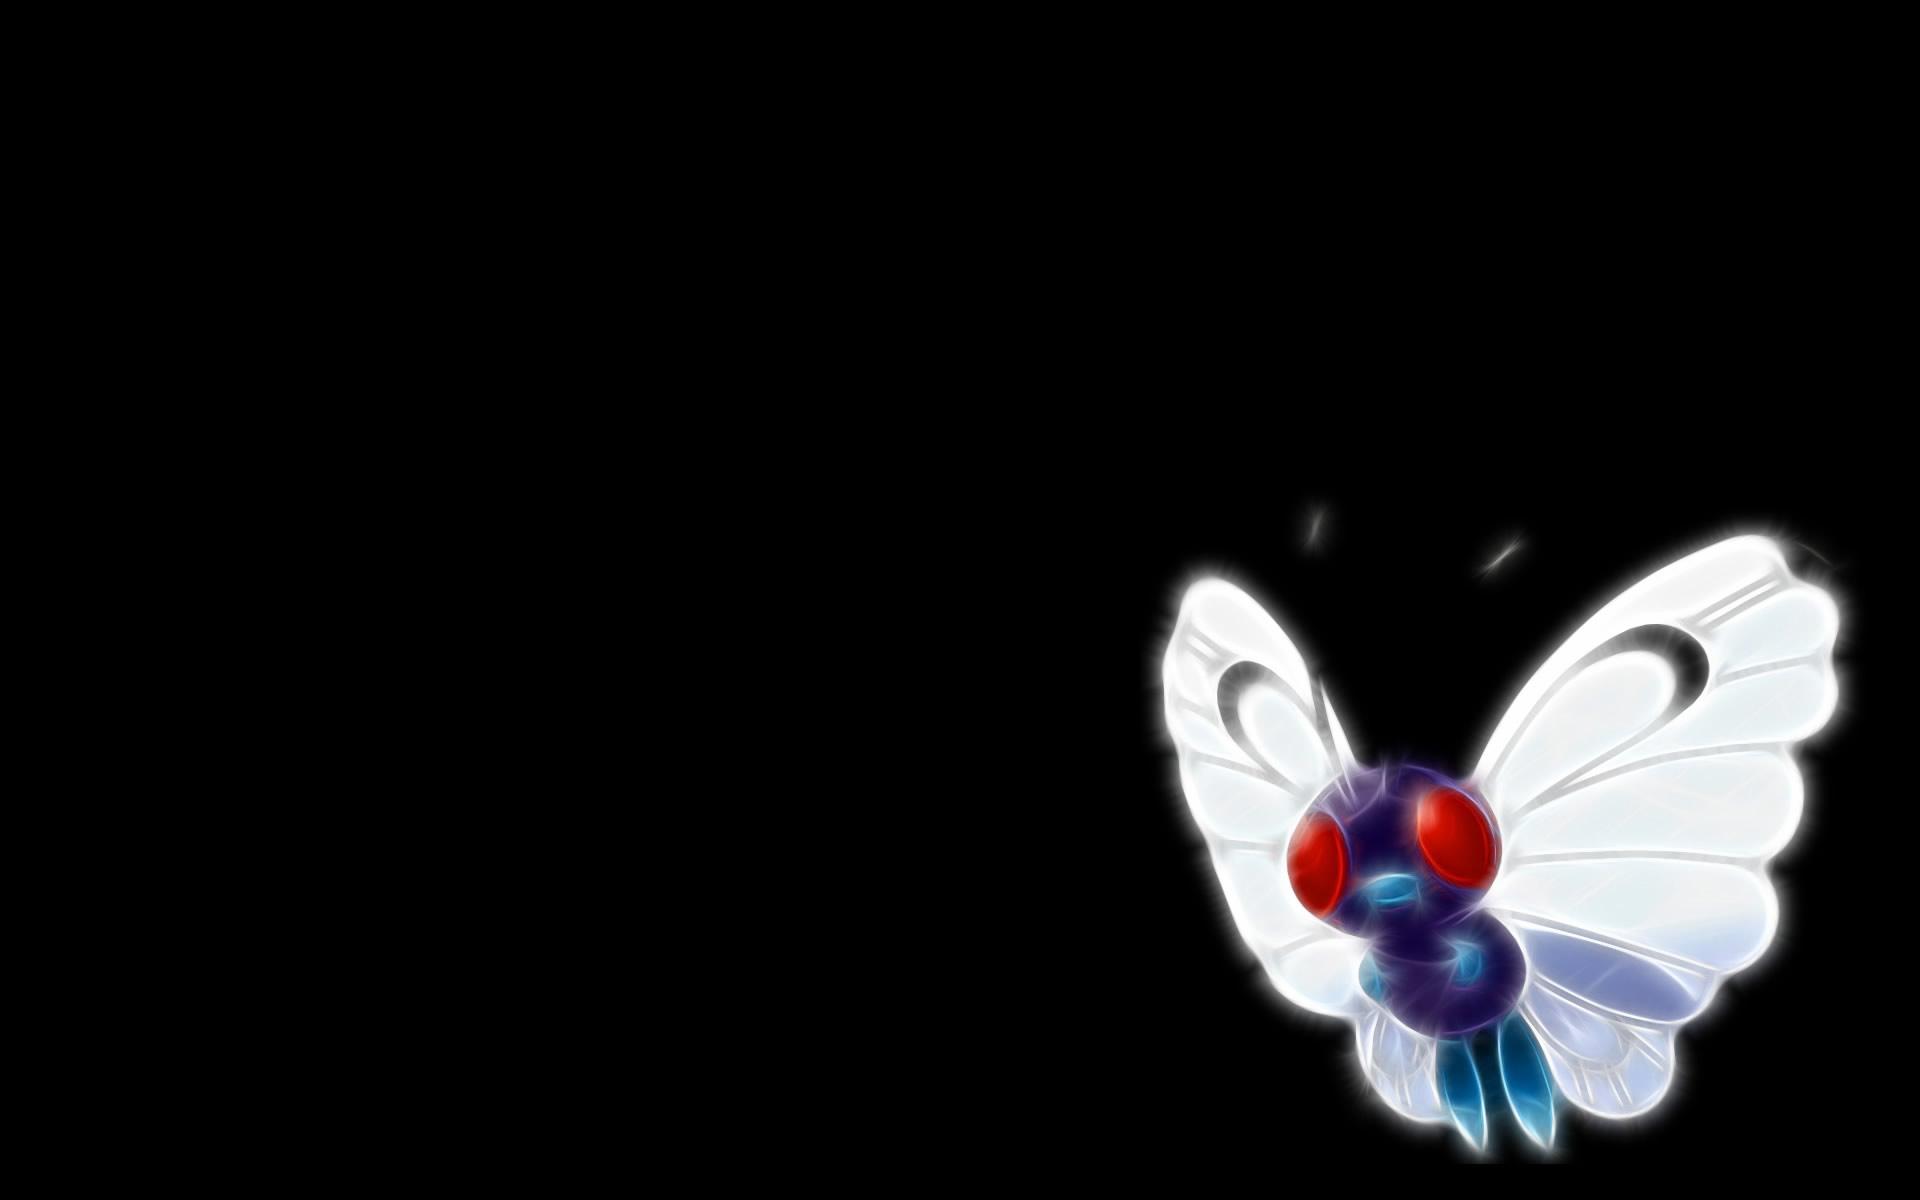 Mariposa Fondo